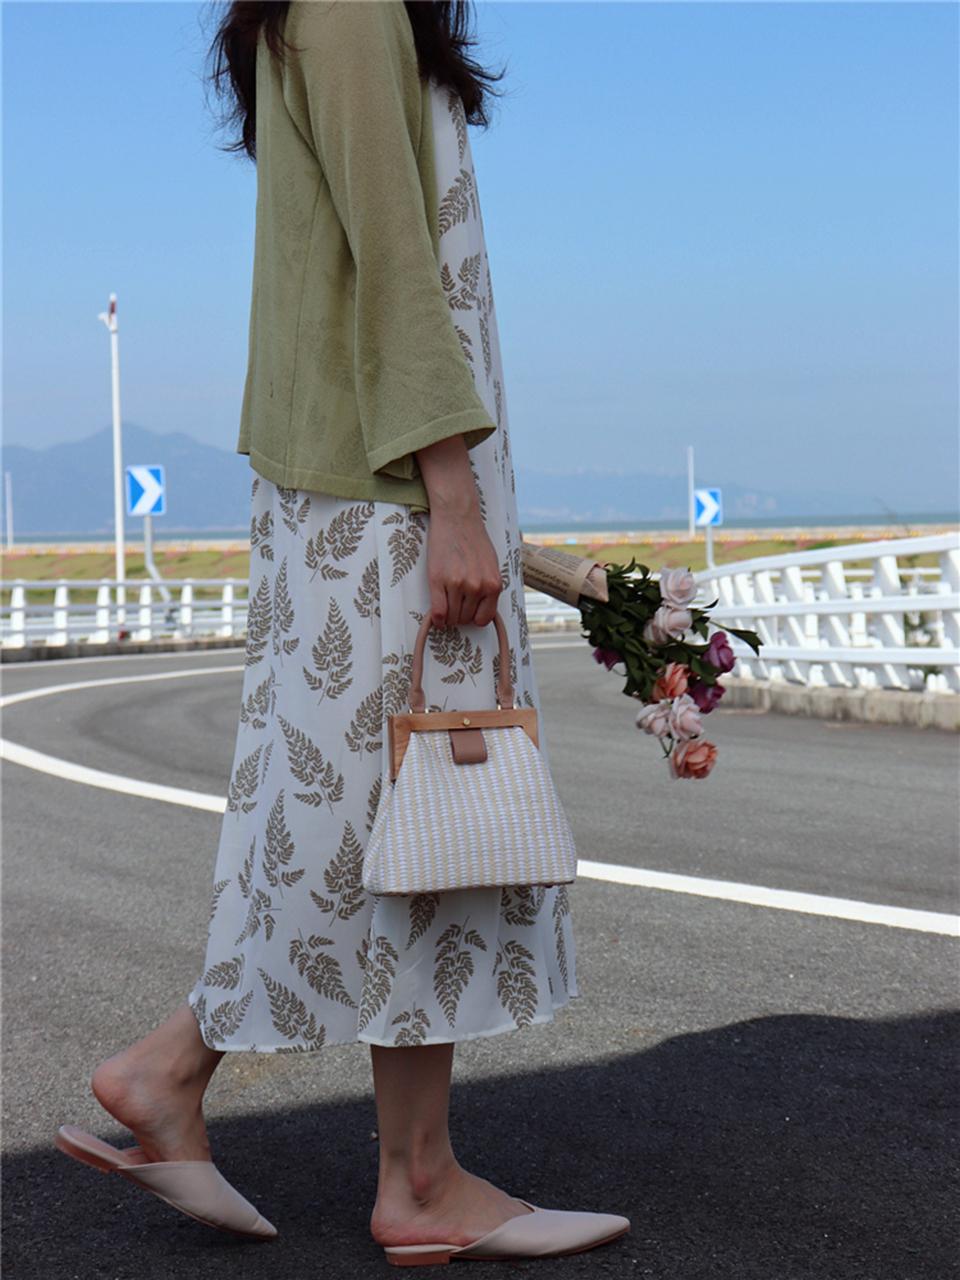 Oswego Straw Bag 2019 New Fashion Wooden Clip Women Shoulder Bag Summer Travel Beach Bag Luxury Handbags Women Bags Designer 12